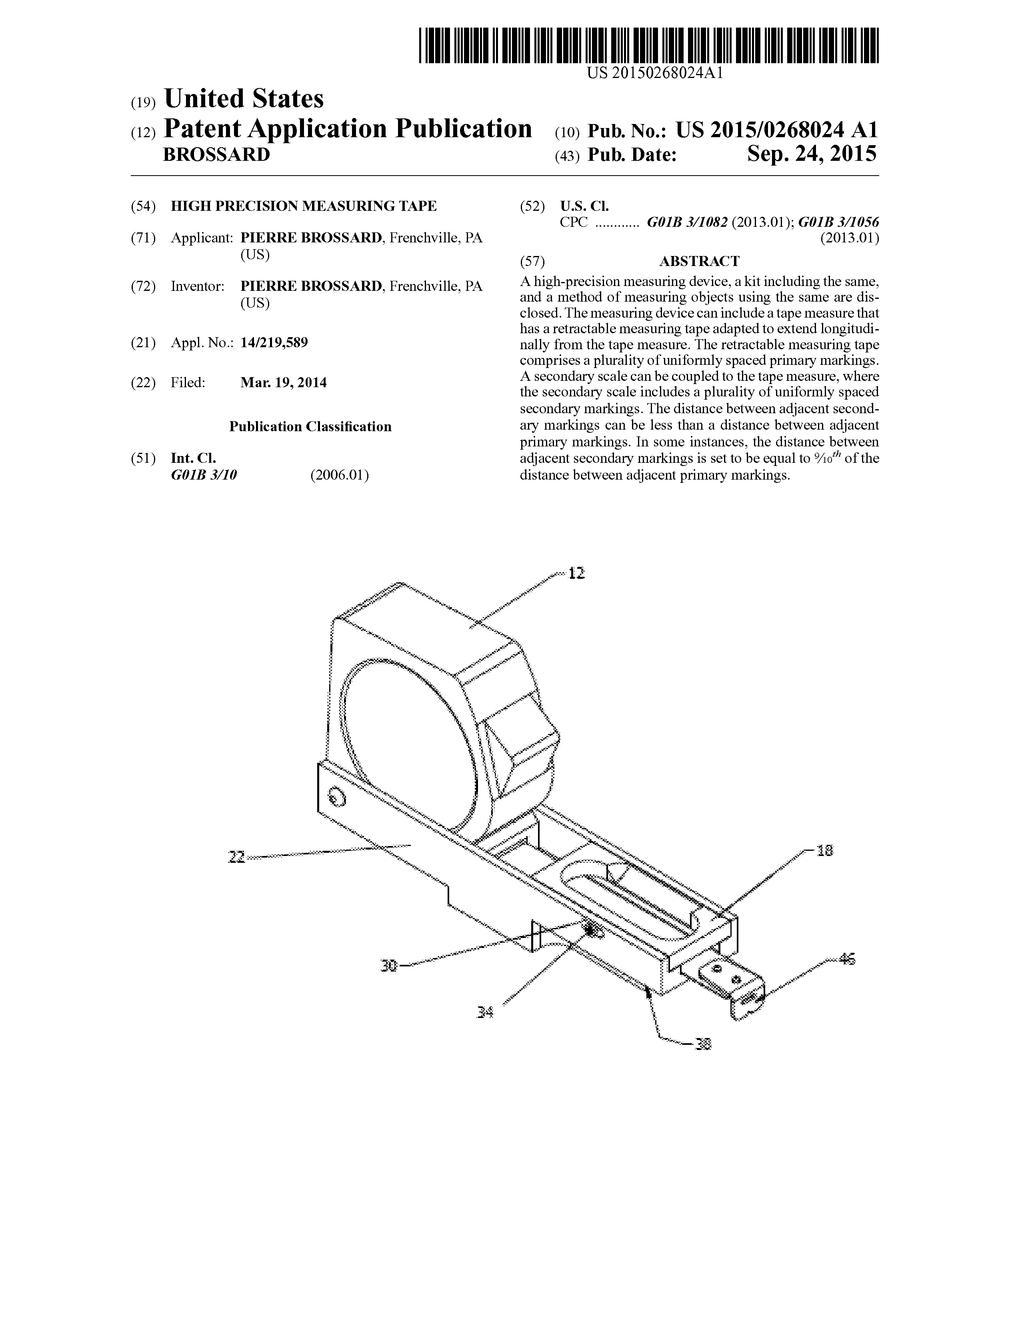 high precision measuring tape diagram schematic and image 01 rh patentsencyclopedia com Printable Measuring Tape Inches Parts of a Tape Measure